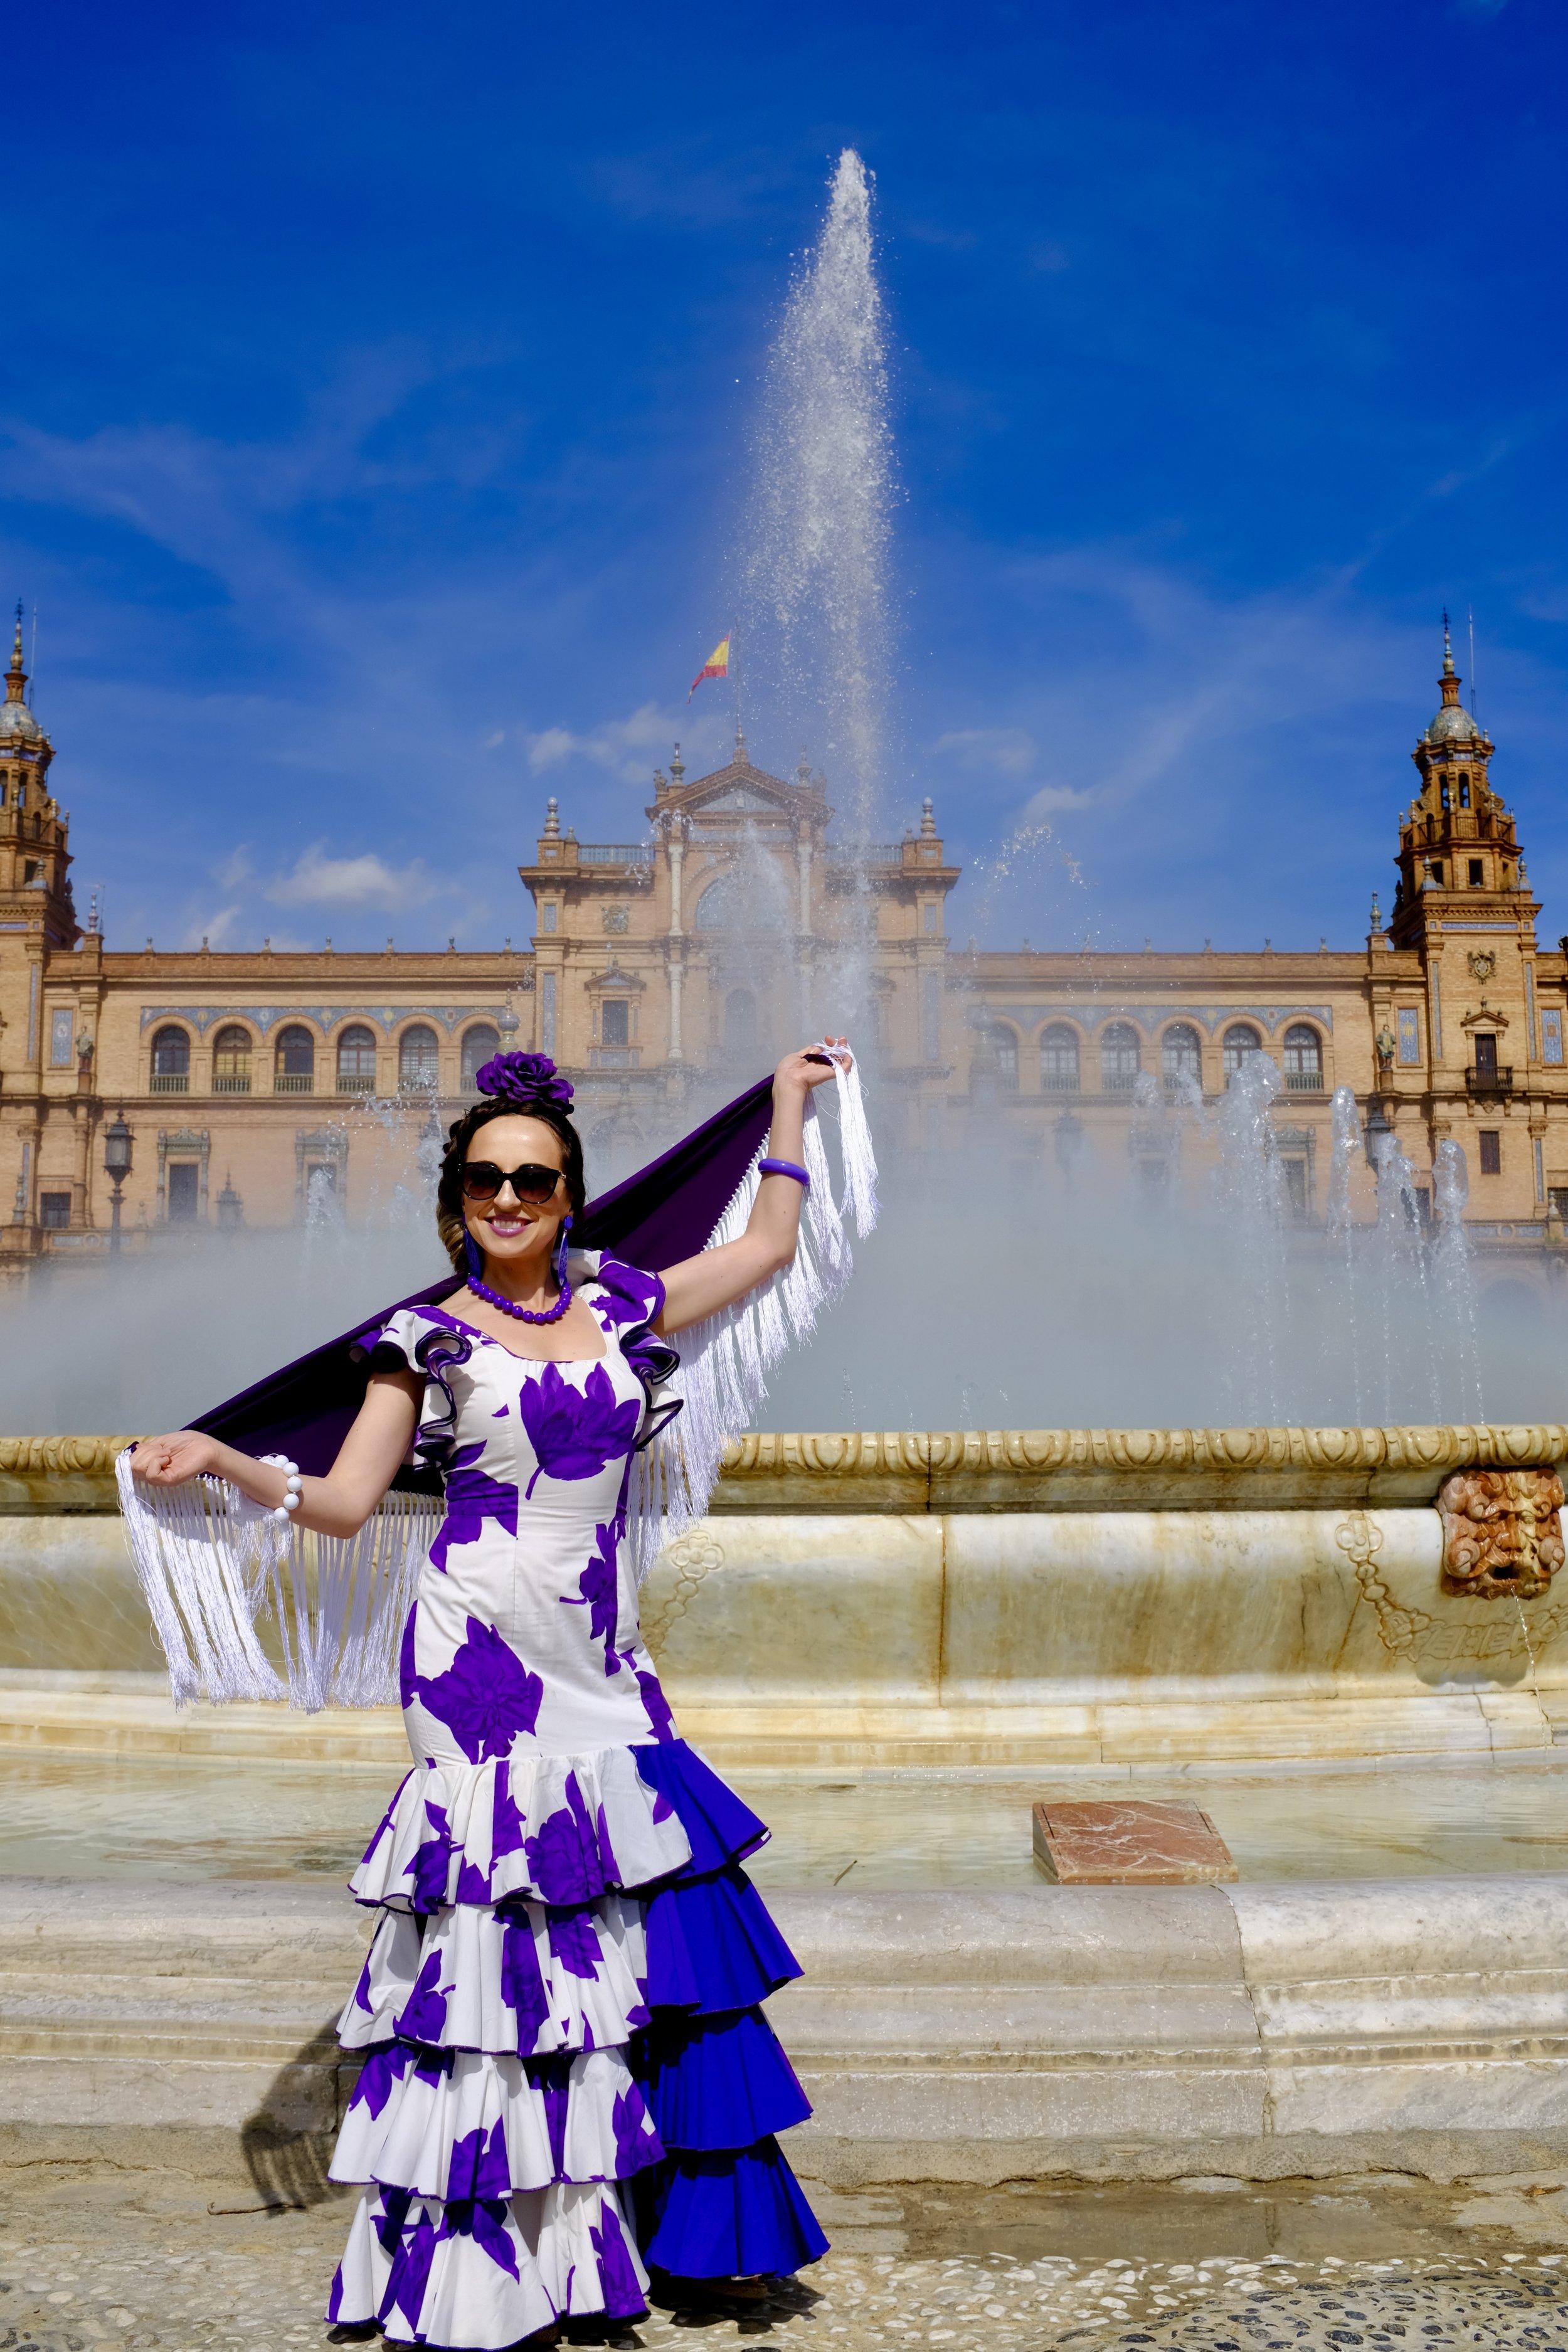 Plaza de Espana_ Feria de Abril_City Nibbler_Seville